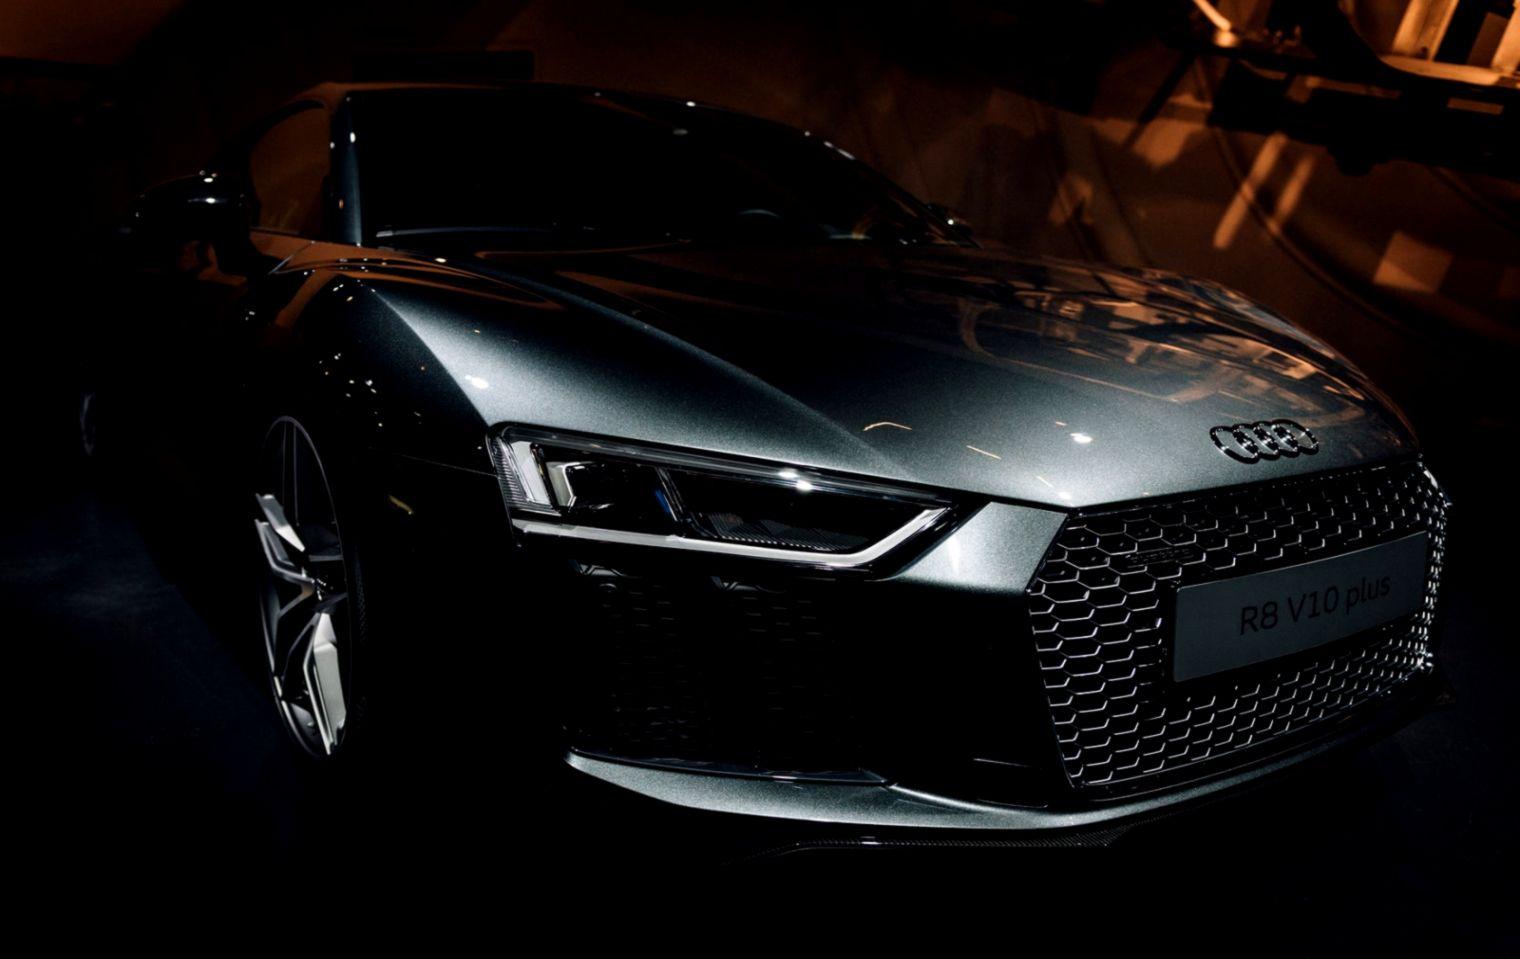 Audi R8 Black Wallpaper Hd Wide Wallpapers